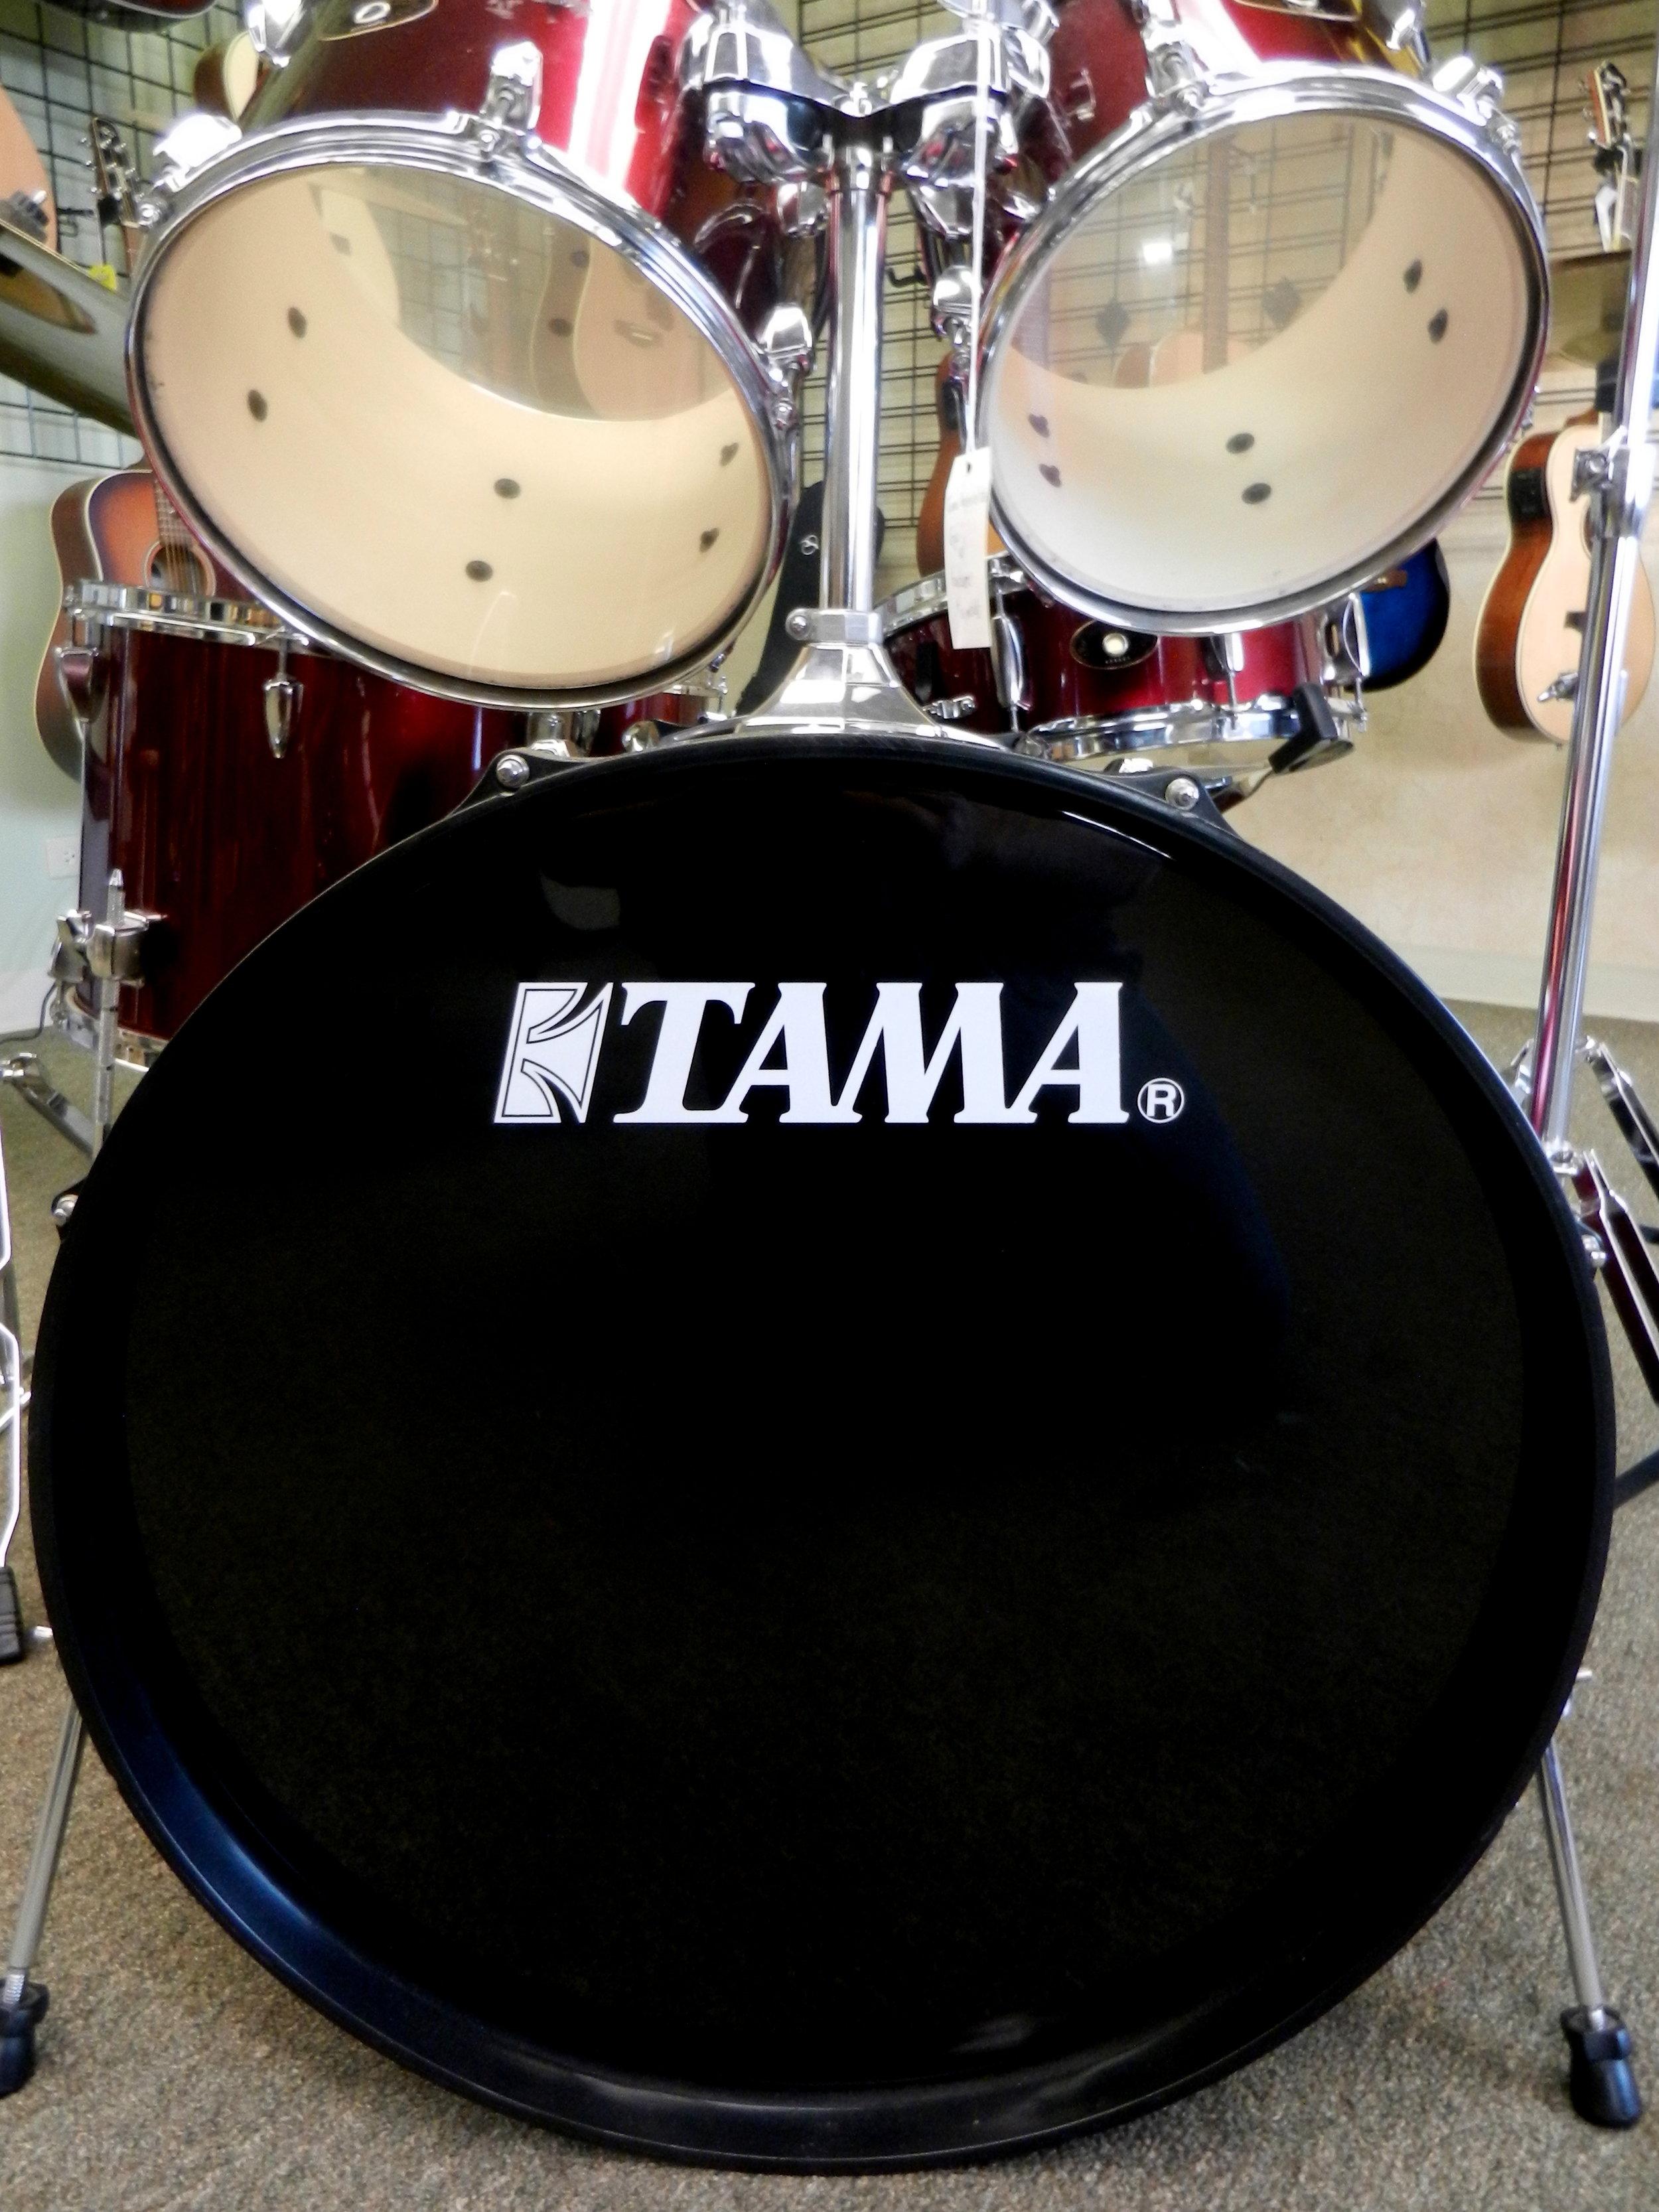 Used Tama Imperialstar Drum Set Bass Drum.JPG